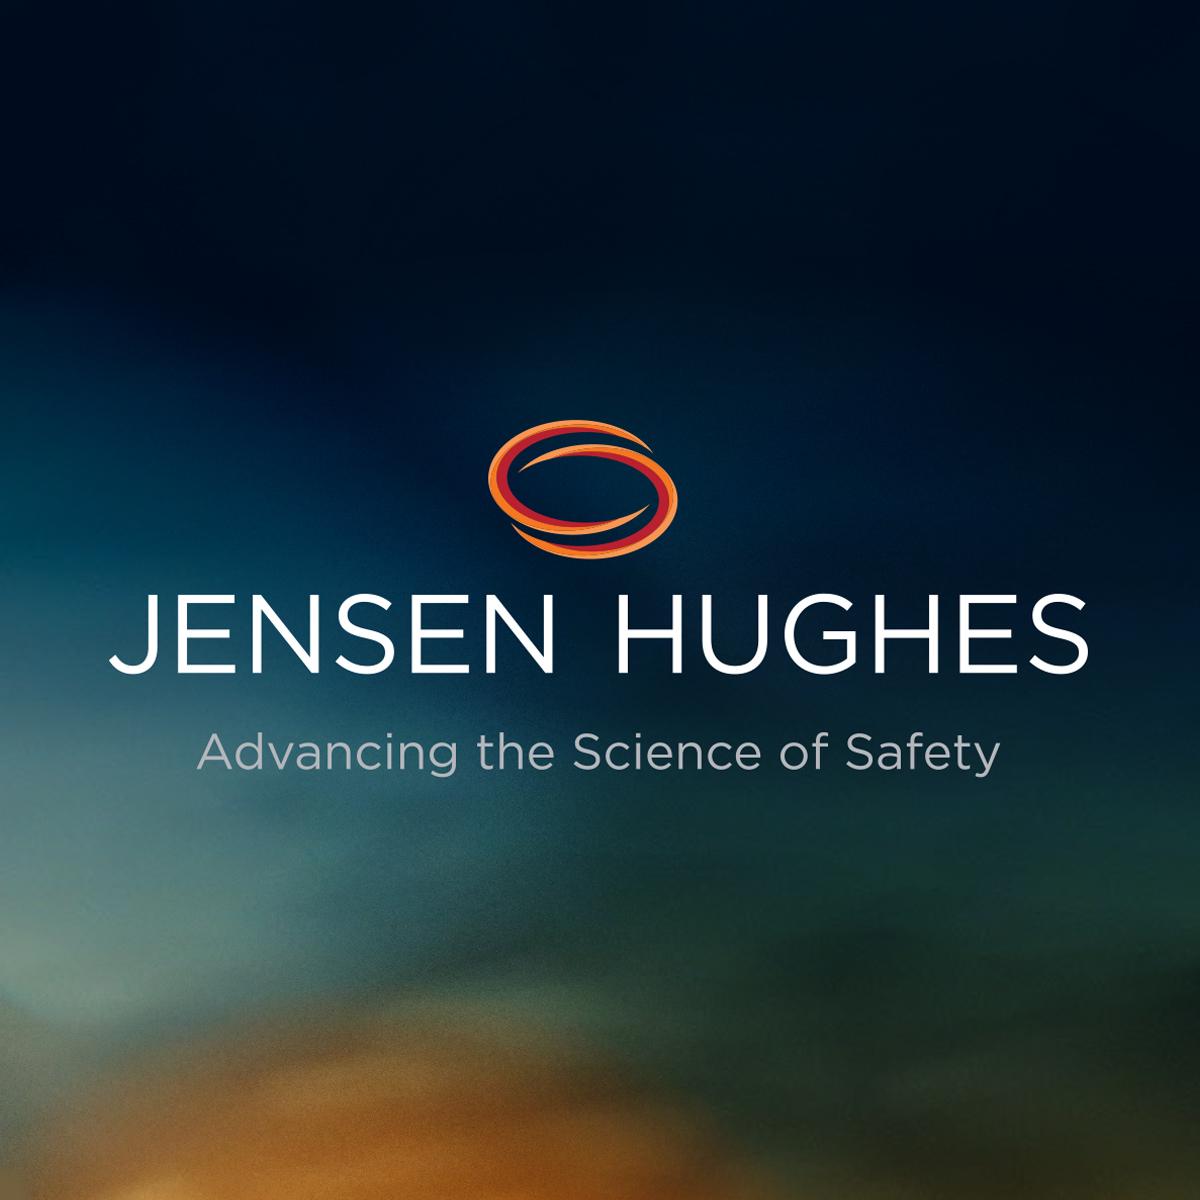 Jensen Hughes Case Study Image